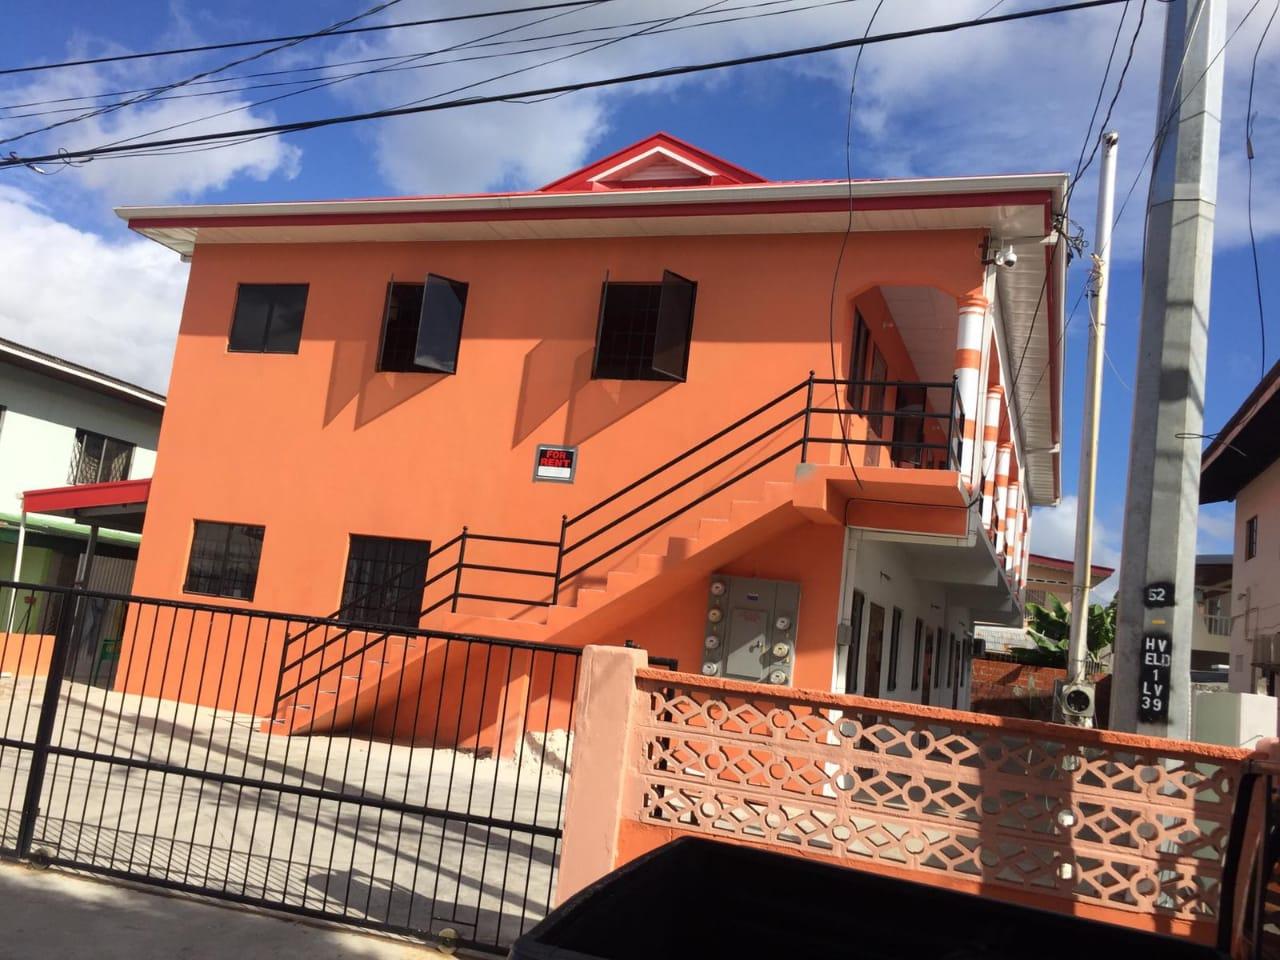 Residential Rental – Boodoo Street, El Dorado